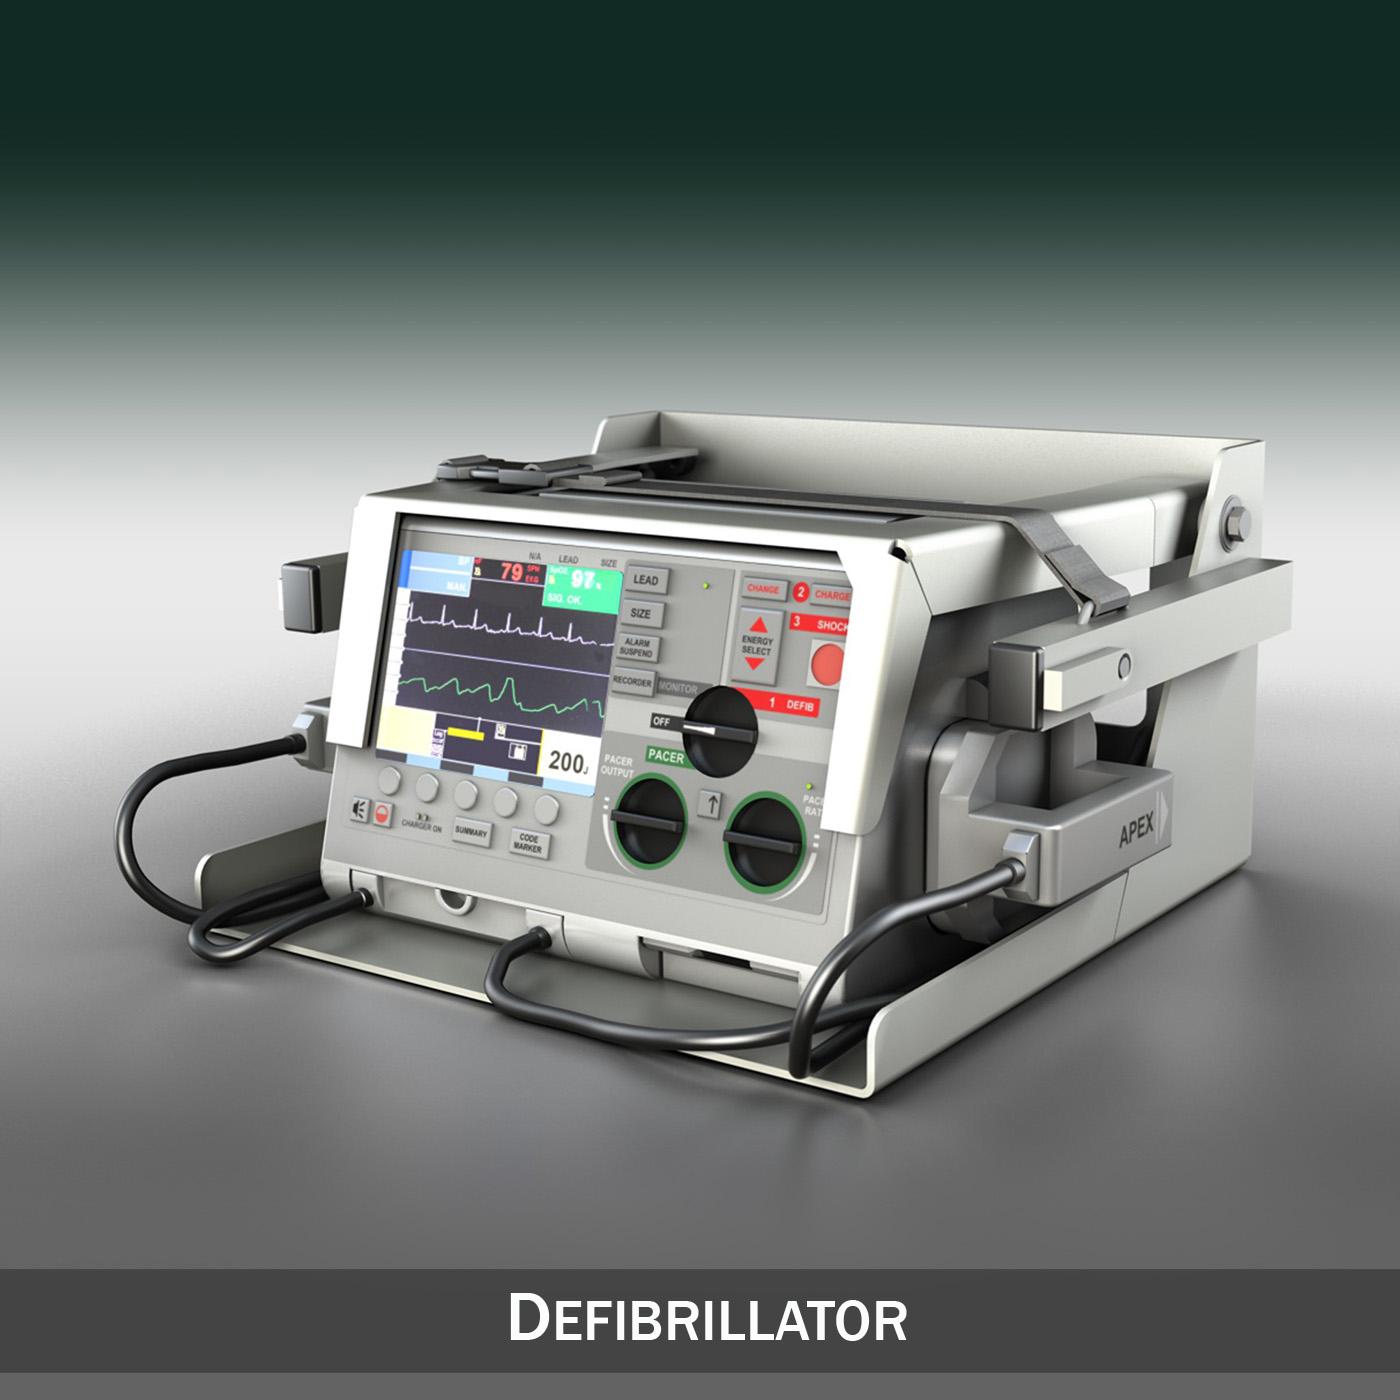 Defibrillator 3d model 3ds c4d lwo lws lw obj 264206